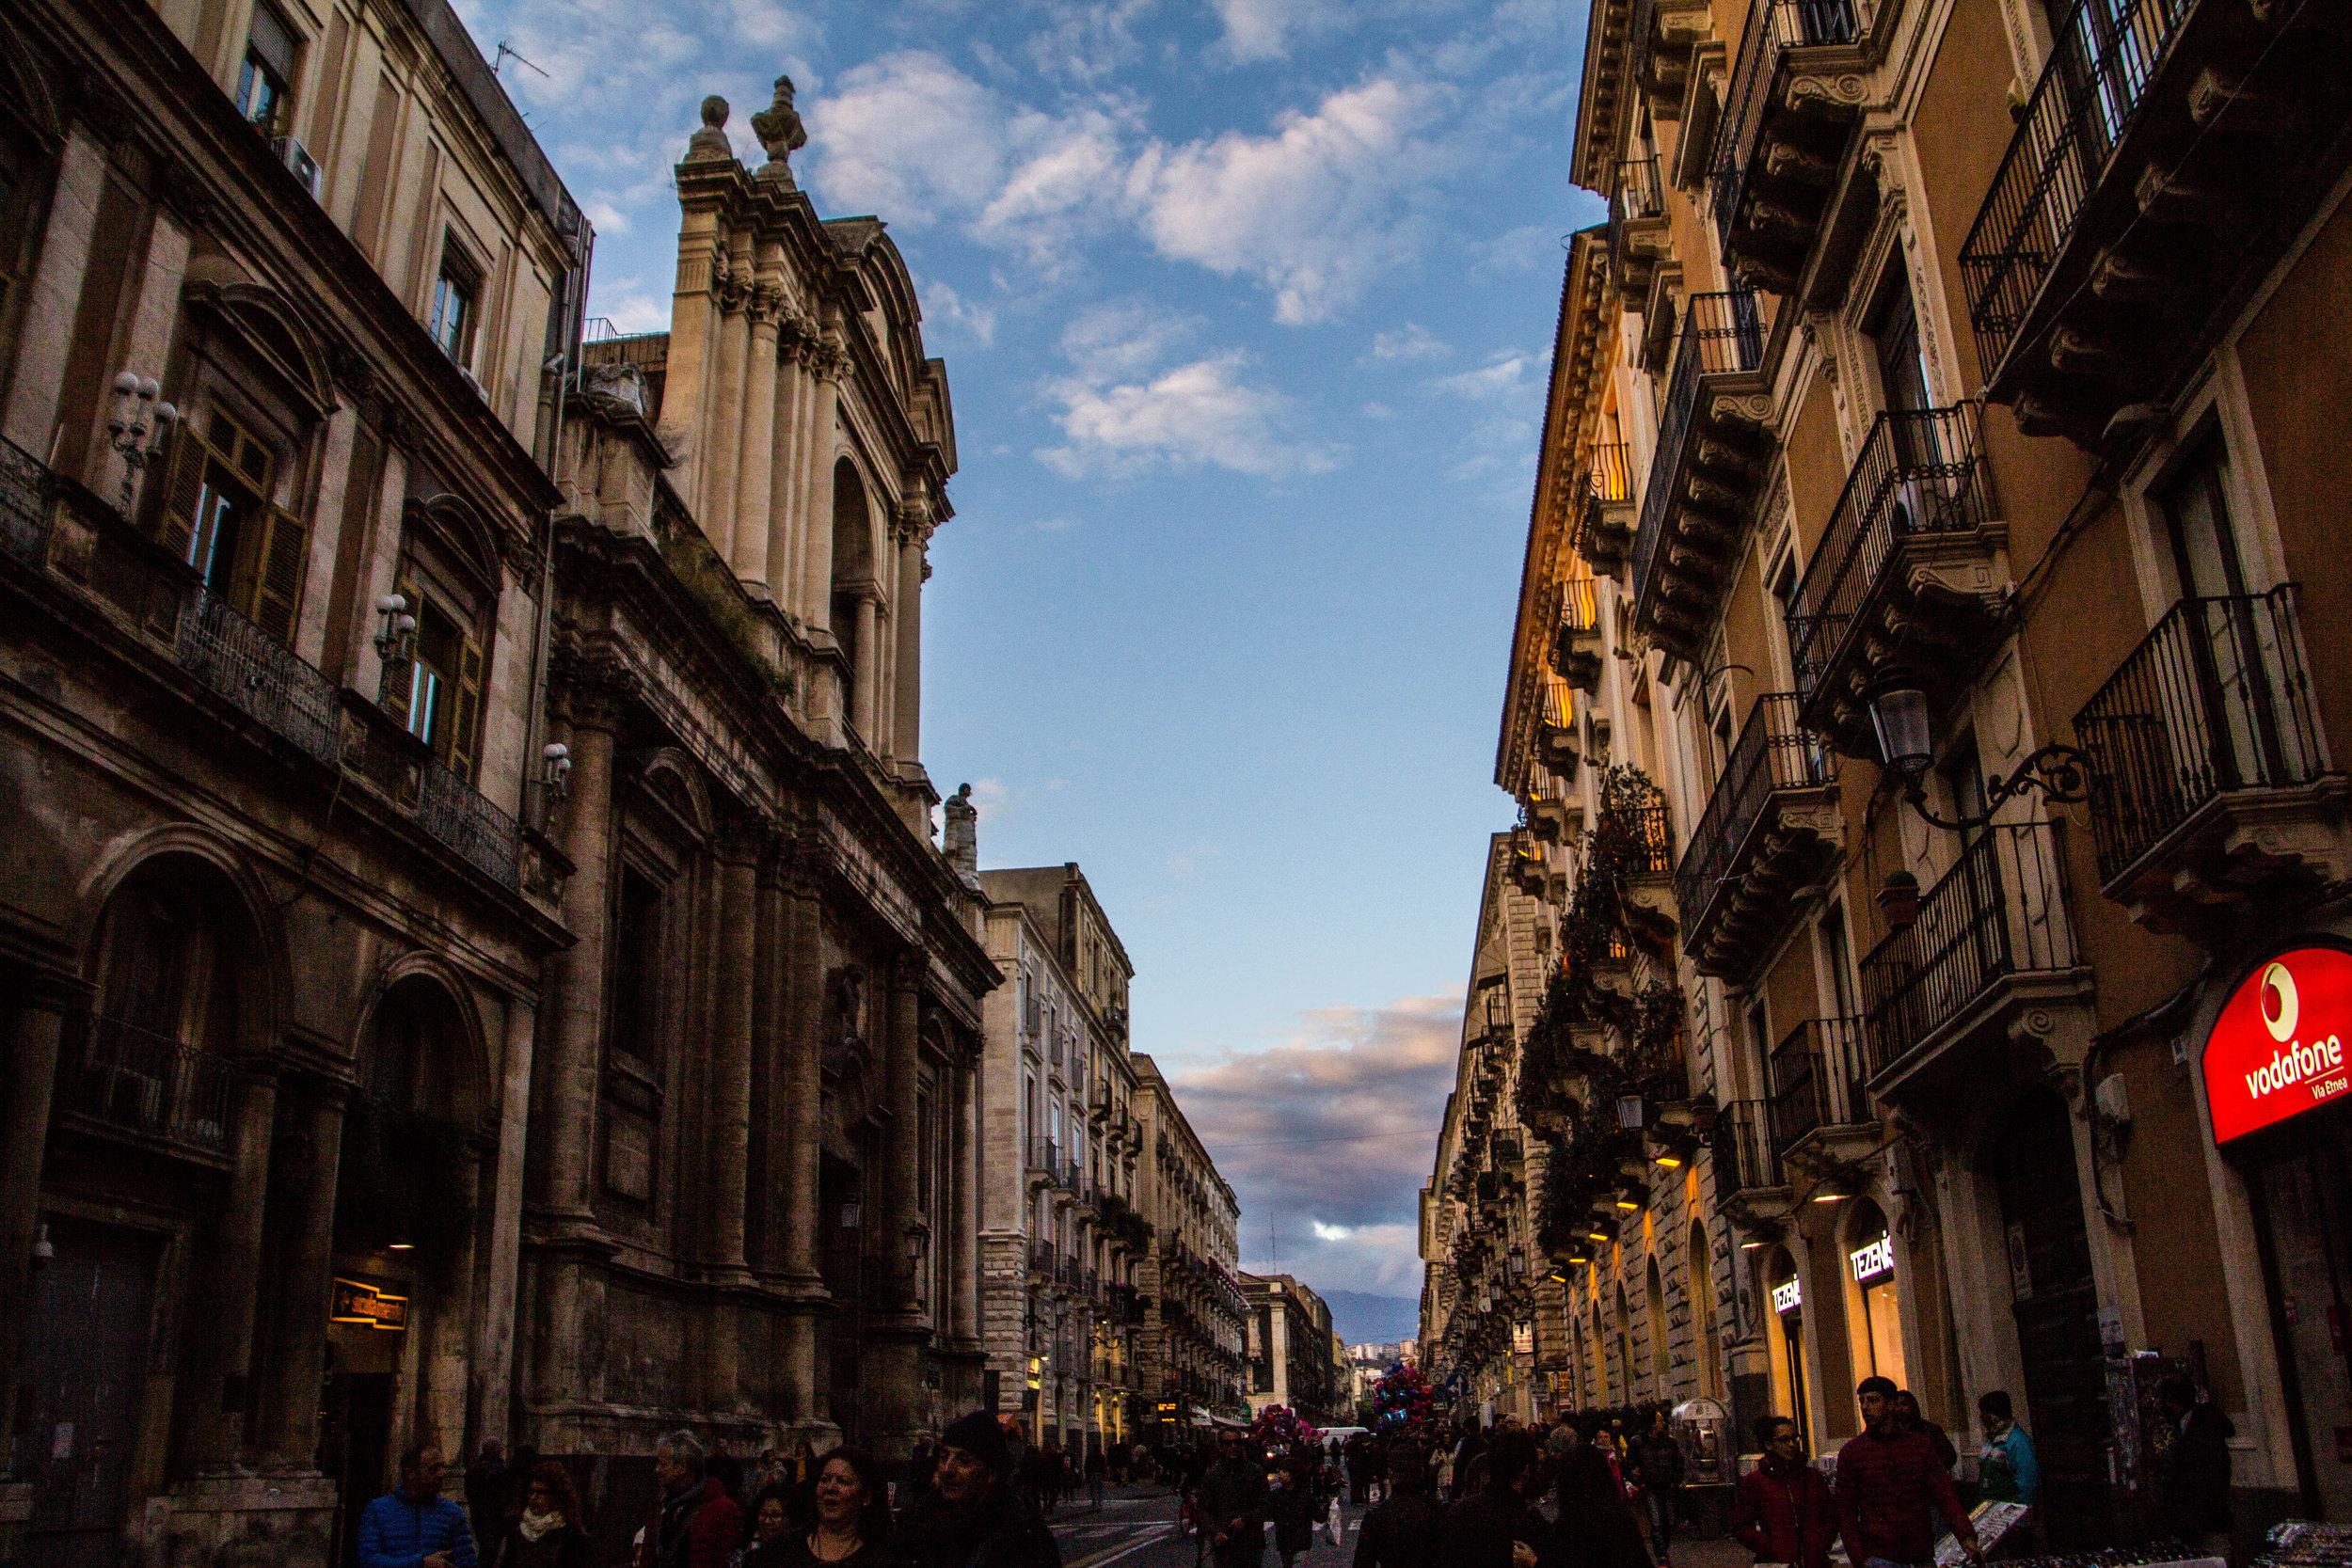 streets-catania-sicily-sicilia-17.jpg